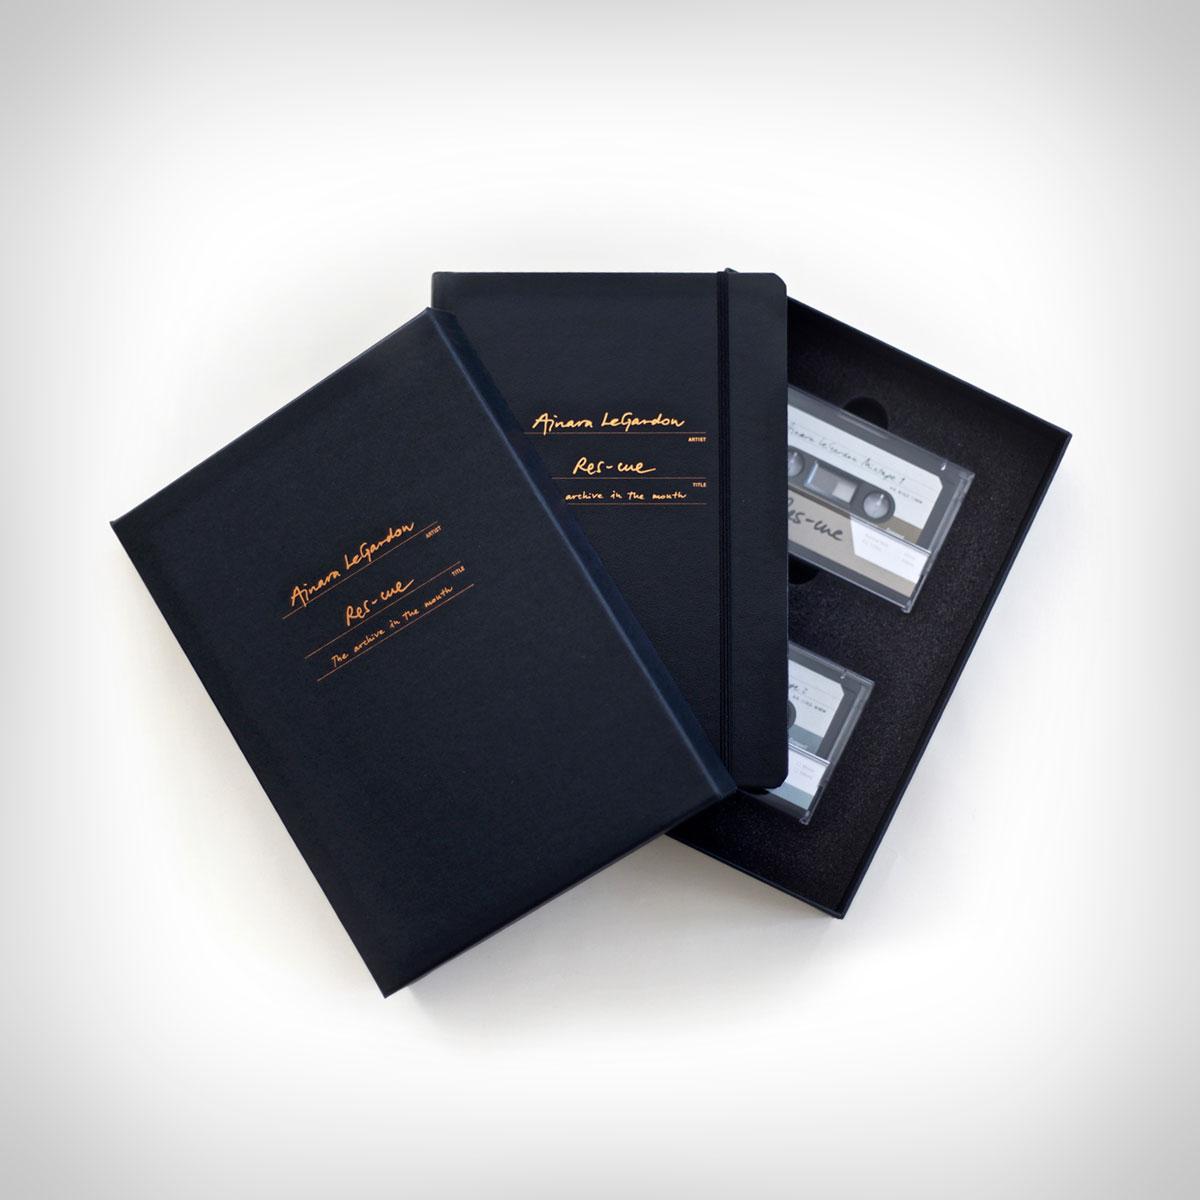 Ainara LeGardon, The Archive In The Mouth